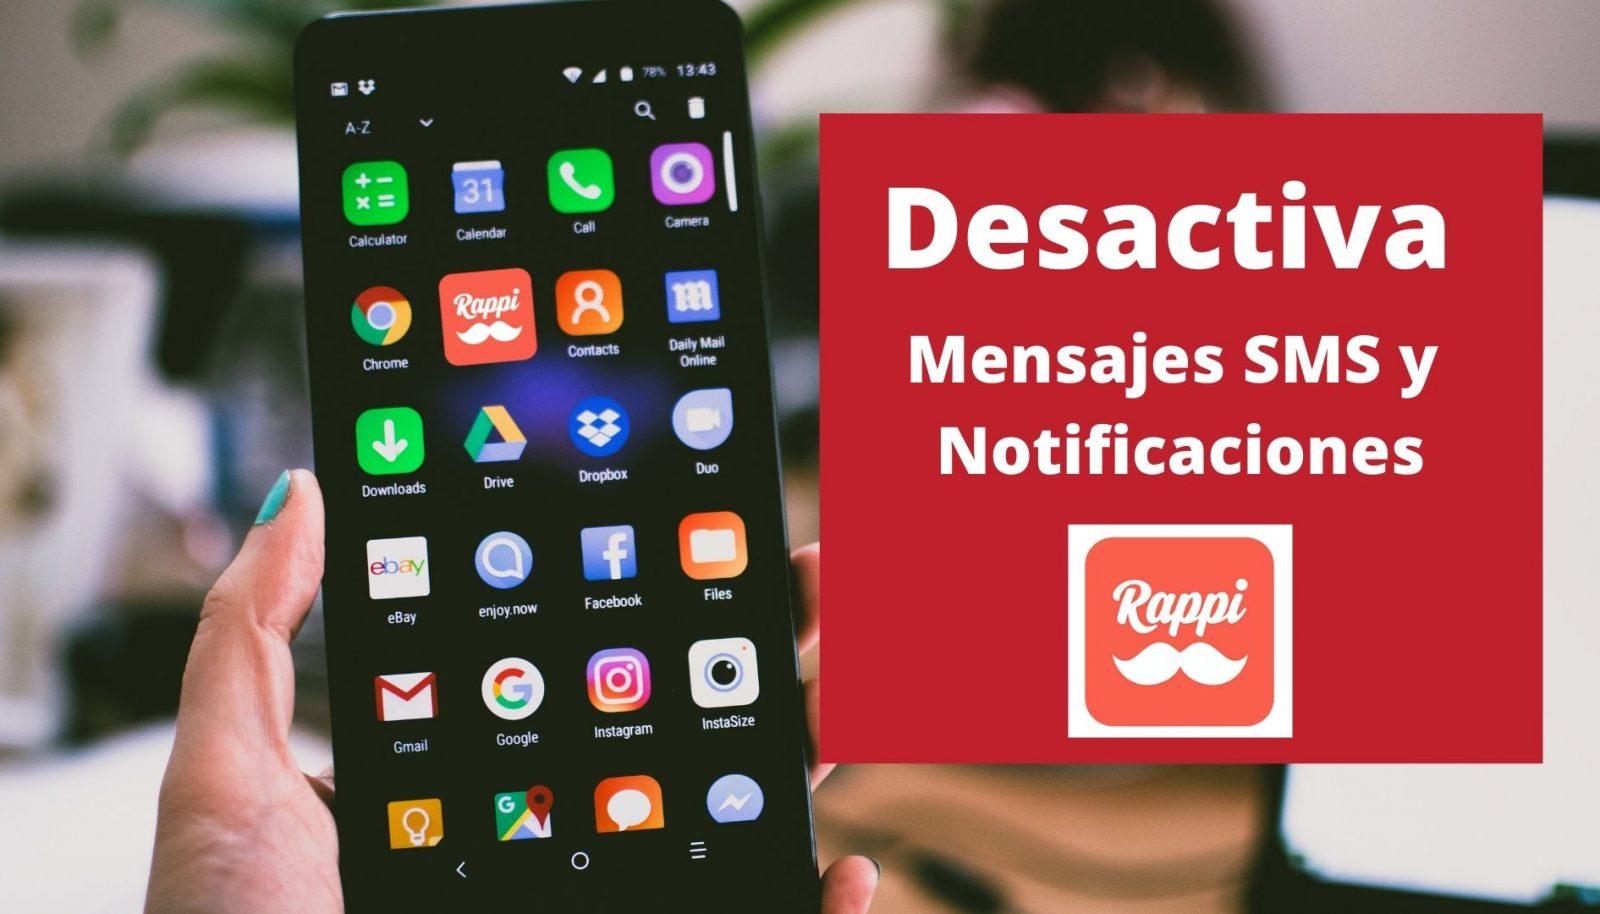 Cómo desactivar mensajes SMS de Rappi